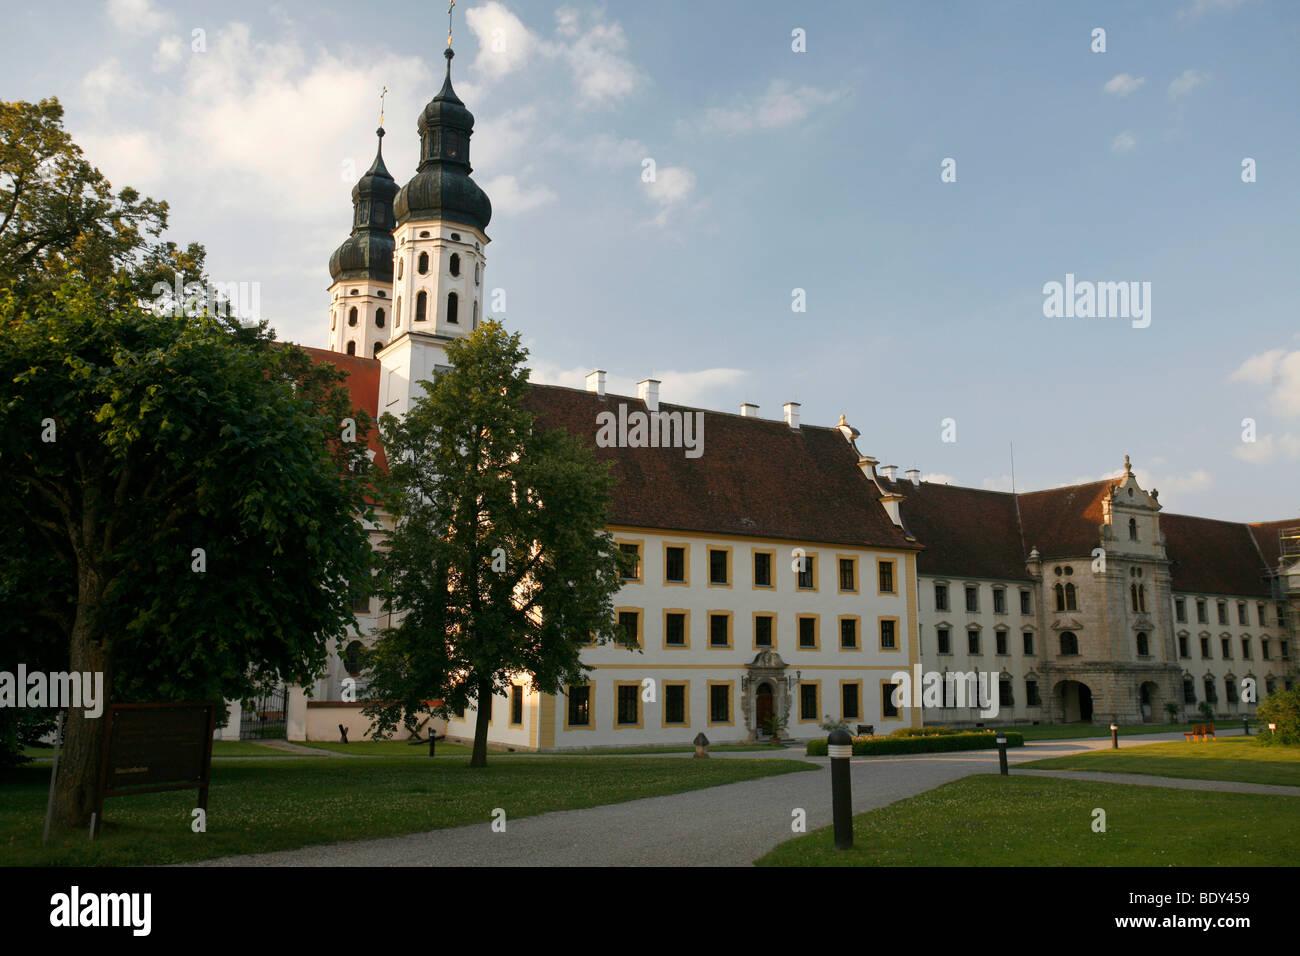 Ecclesiastical Academy of Teacher Education, Church and former monastery Obermarchtal, Alb-Donau-Kreis, Baden-Wuerttemberg, - Stock Image